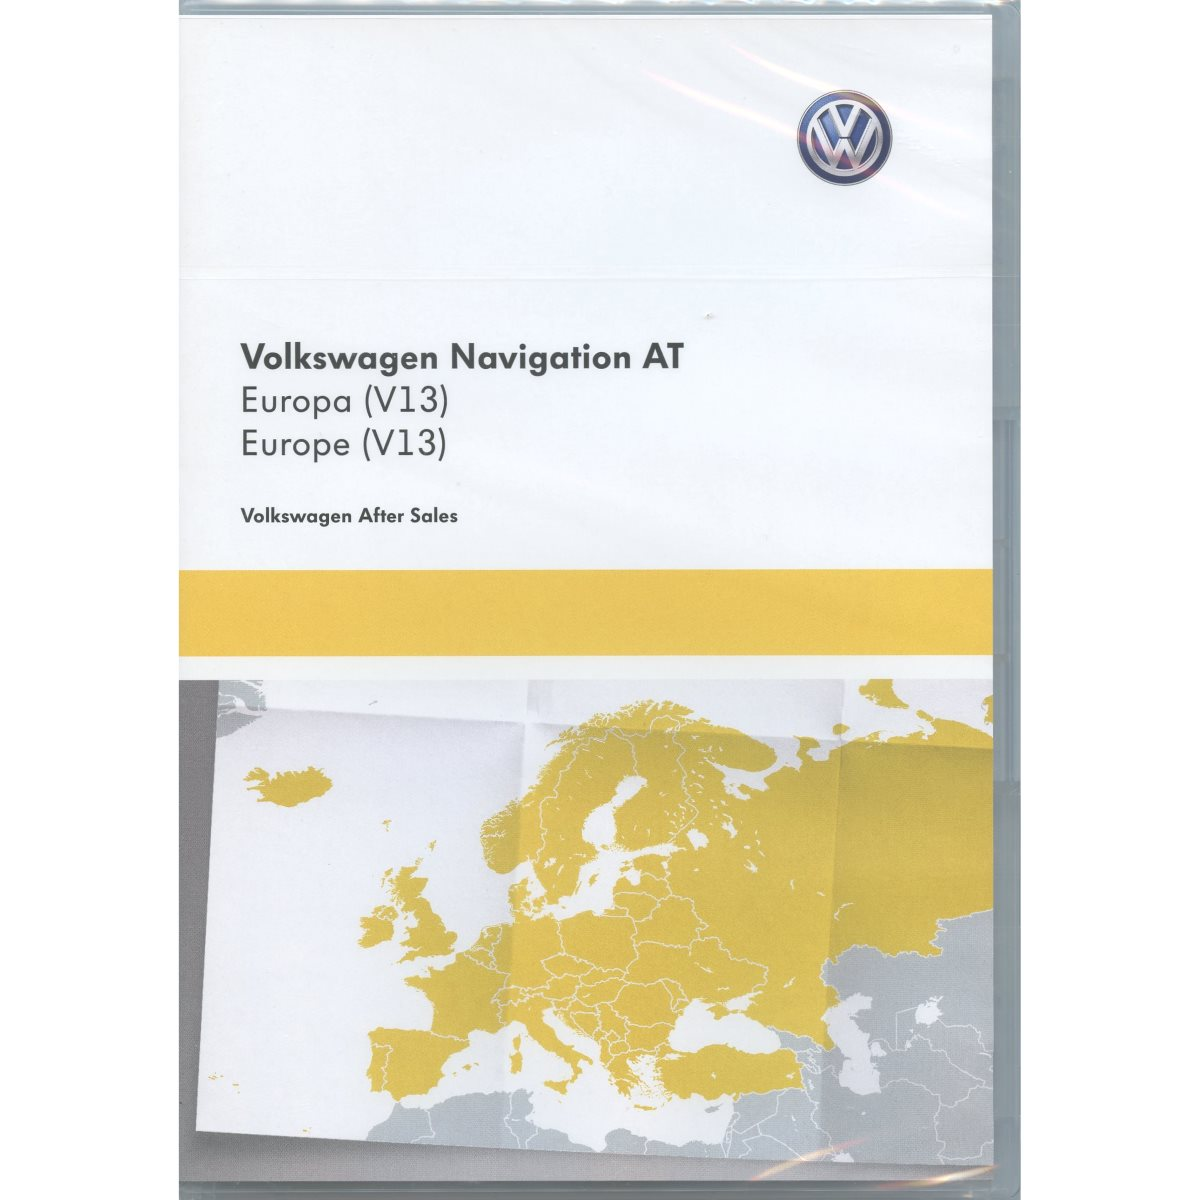 Vw Sd Karte.Sd Karte Europa V13 Navigationssystem Update Navi Kartendaten Discover Media At